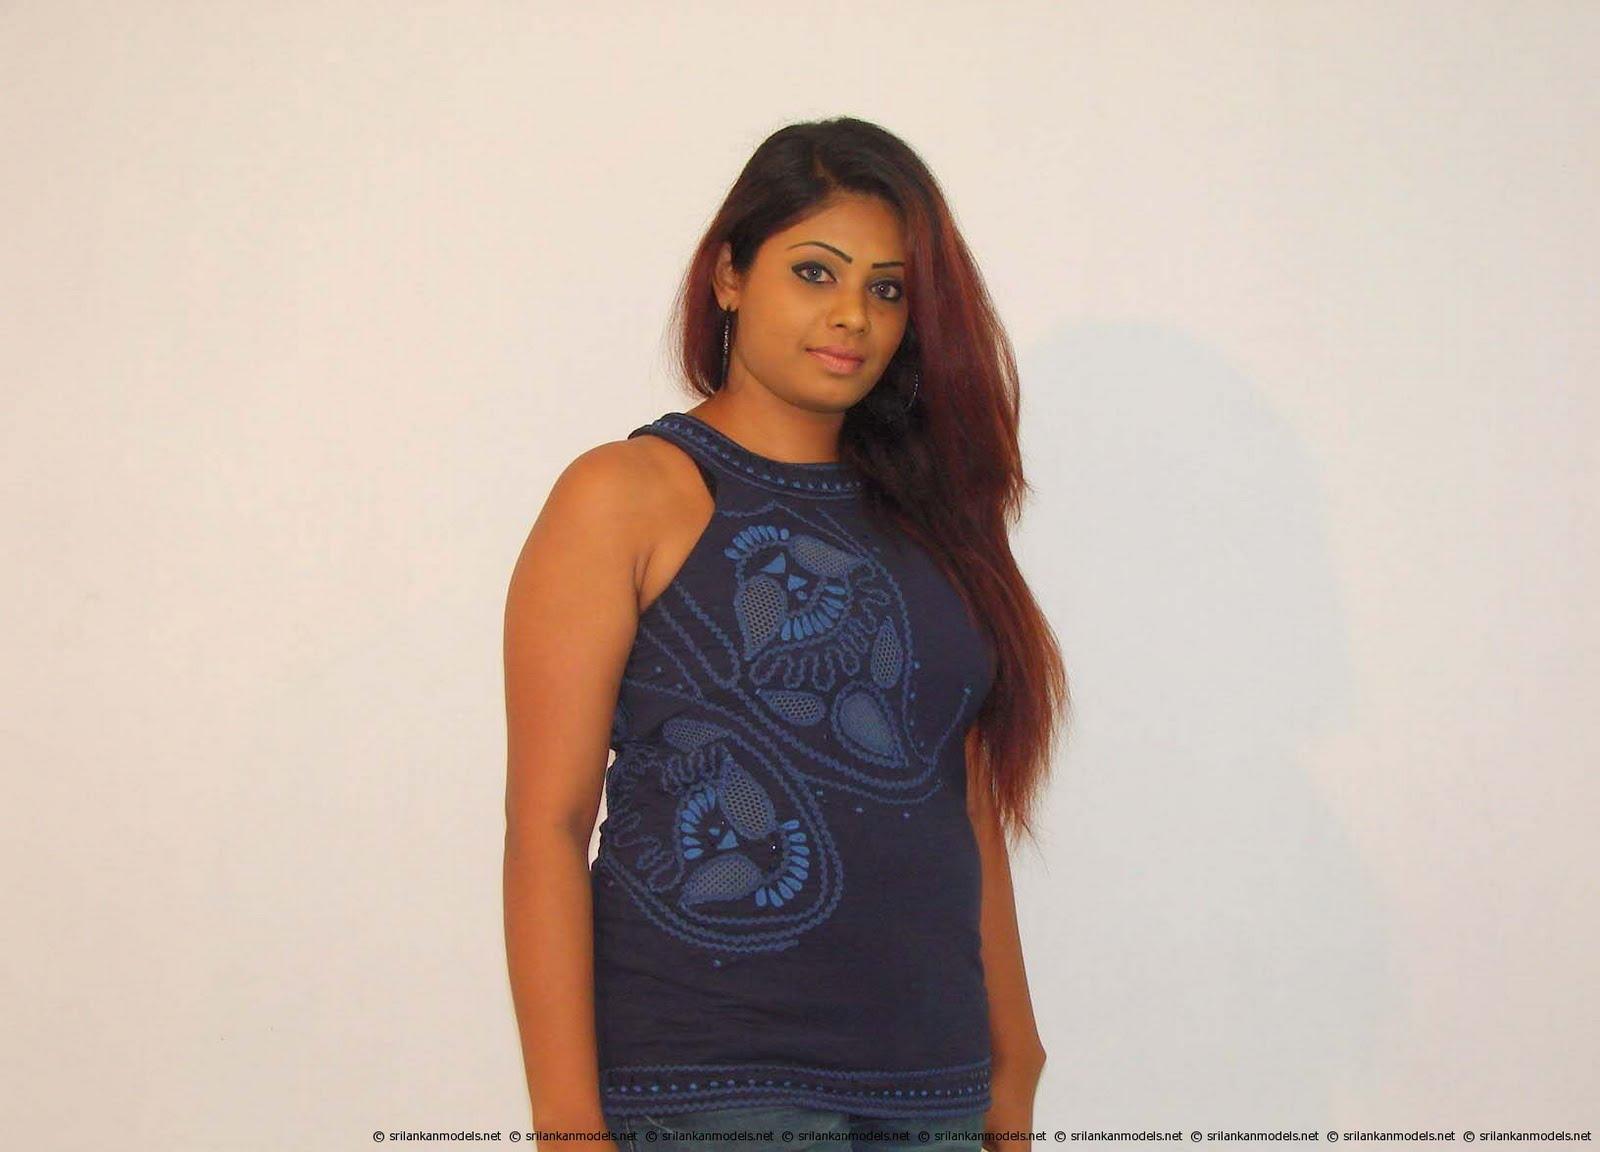 ... Madubashini Upcoming Model : Gossip Lanka News And Sri Lanka Hot News